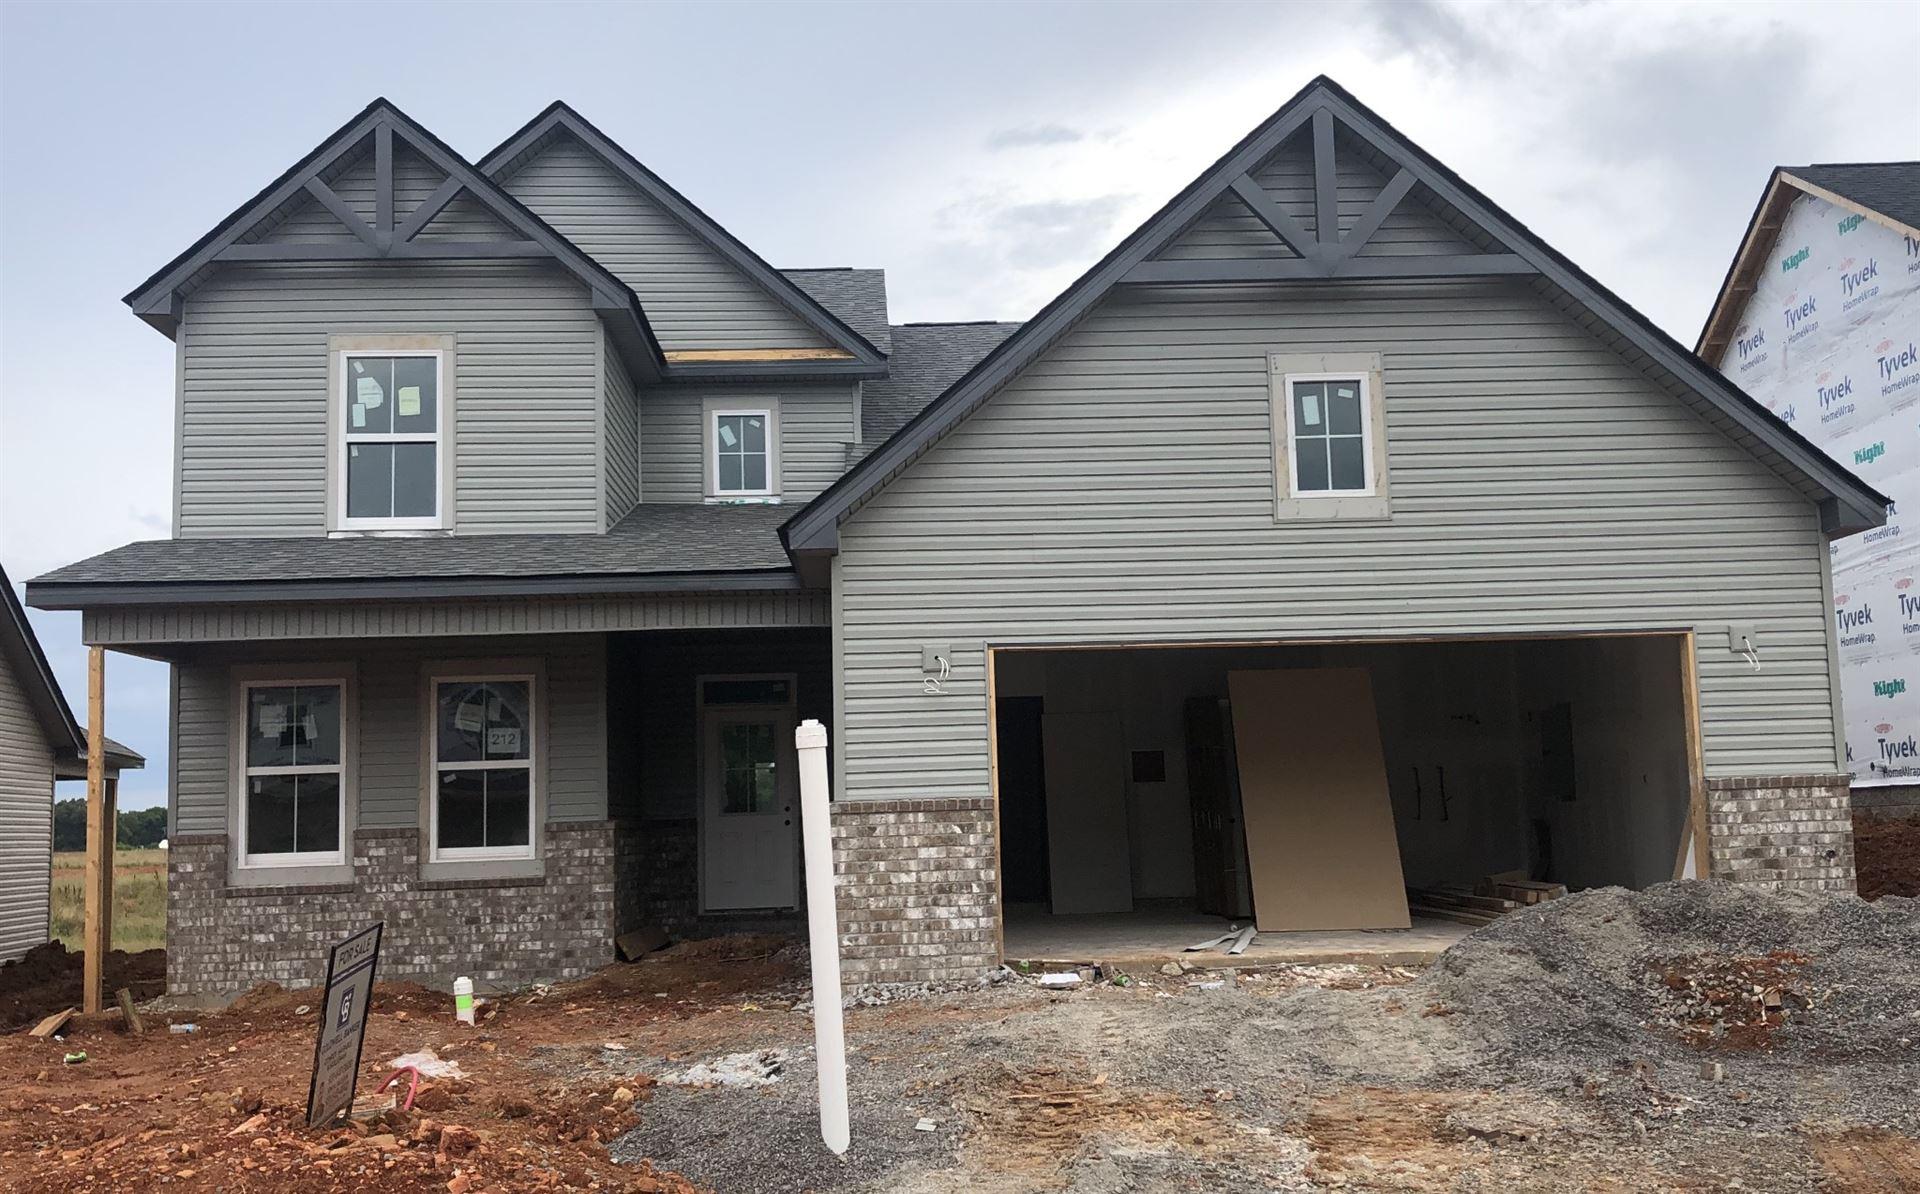 212 Mills Creek, Clarksville, TN 37042 - MLS#: 2255527